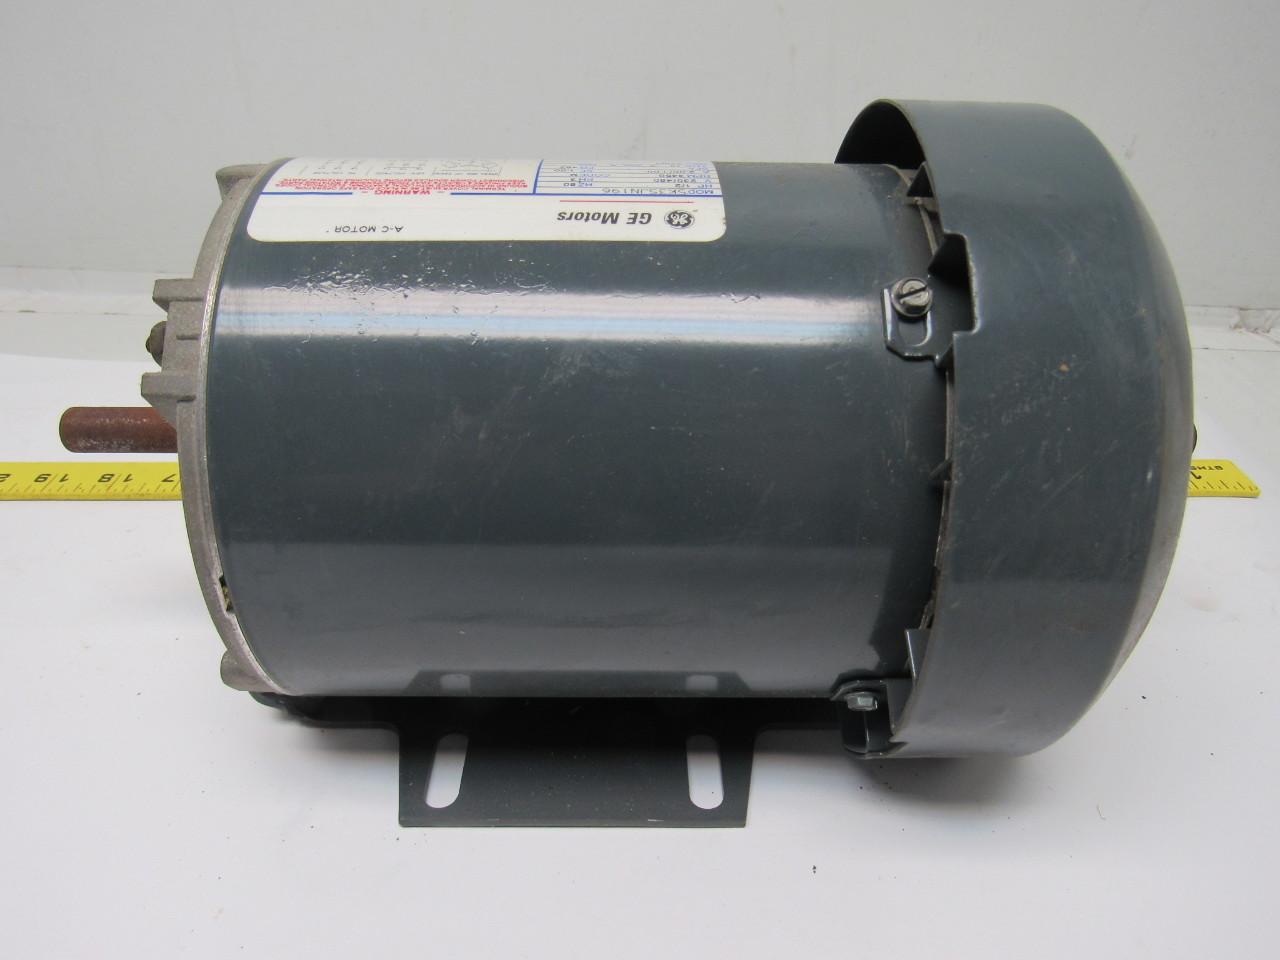 Ge General Electric 5k35jn196 1 2hp Electric Motor 230